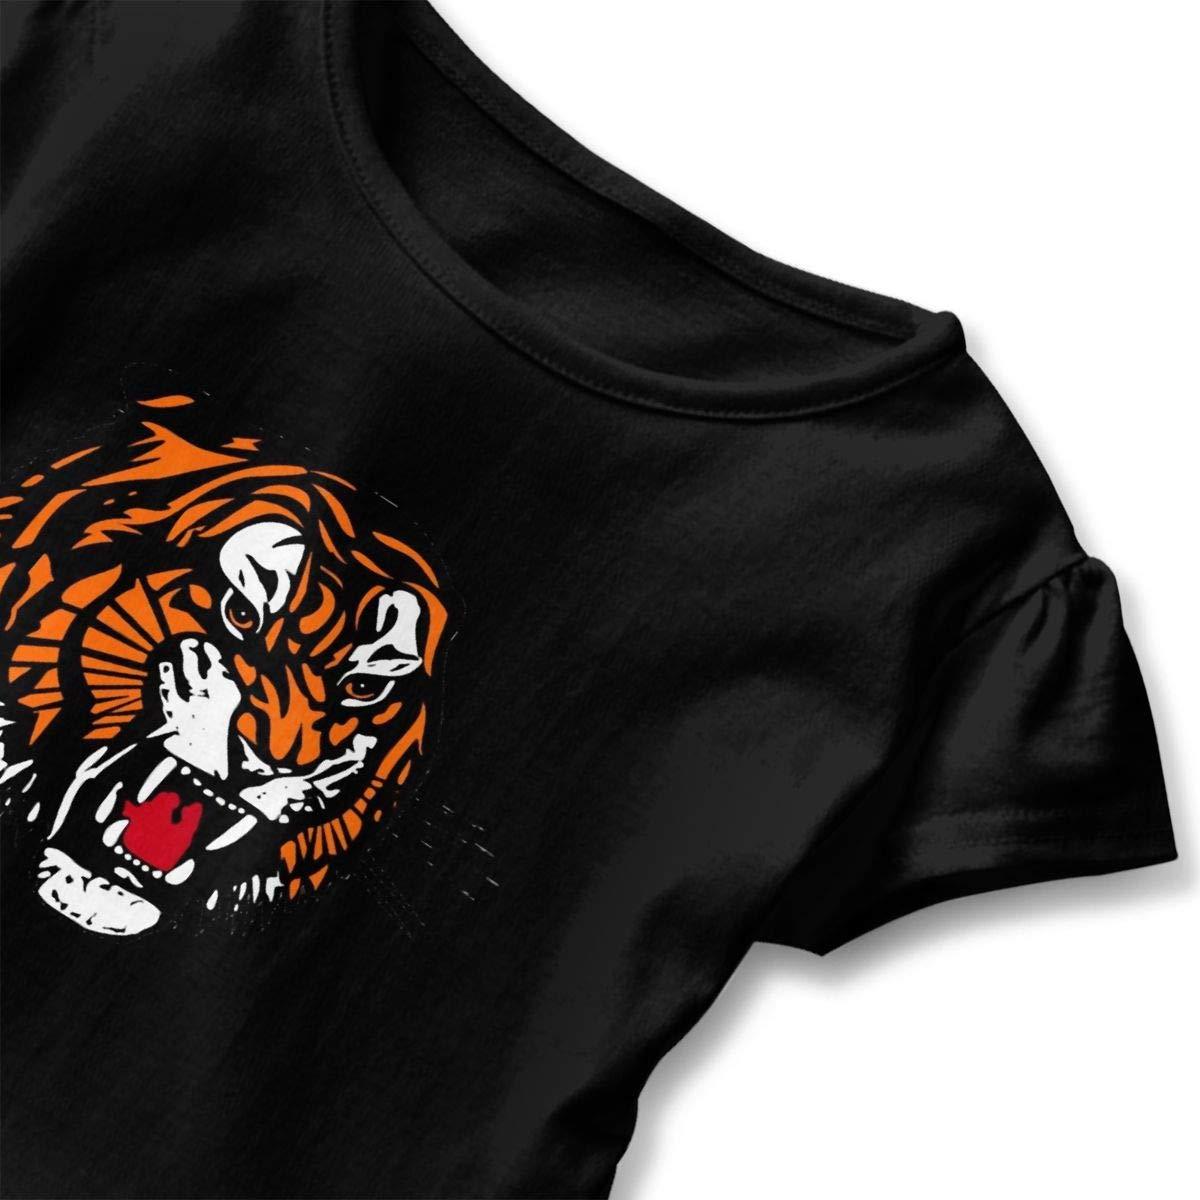 Princeton Tigers Shirt Cartoon Infant Girl Flounced T Shirts Graphic T-Shirt for 2-6T Kids Girls